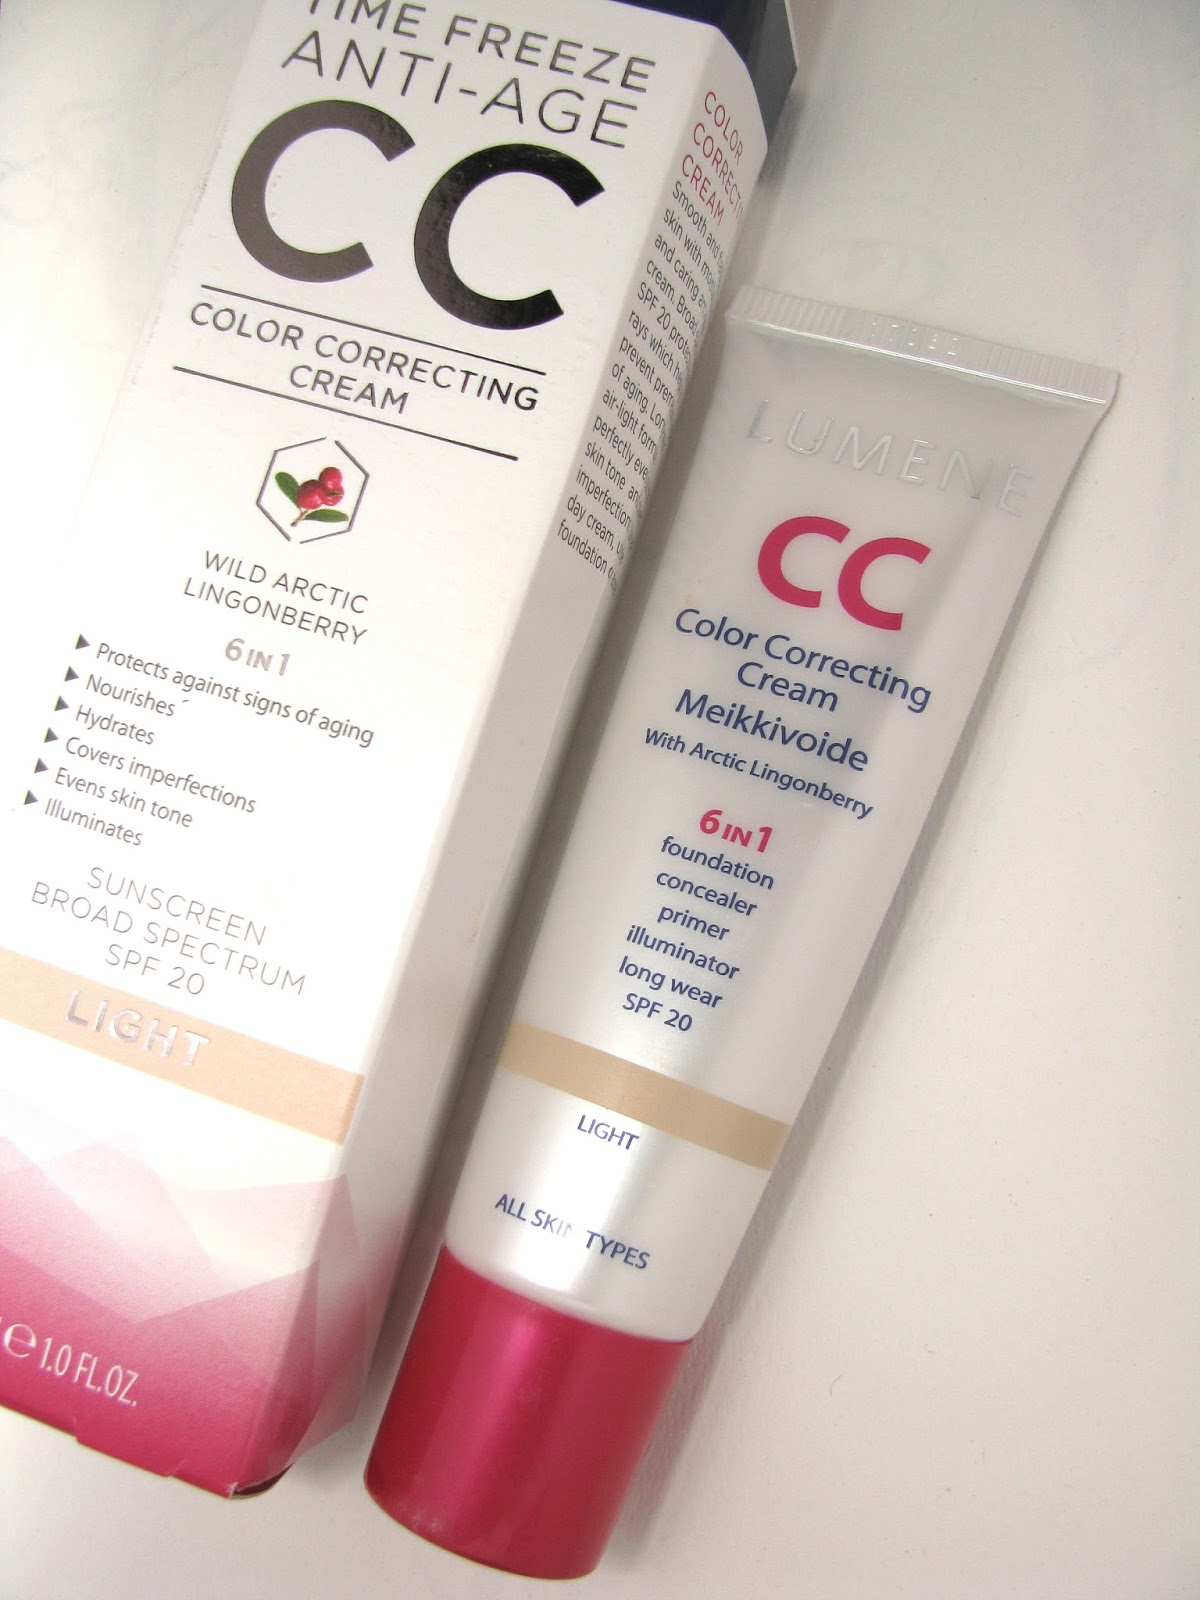 The Beauty Alchemist: Lumene Time Freeze Anti Age CC Cream